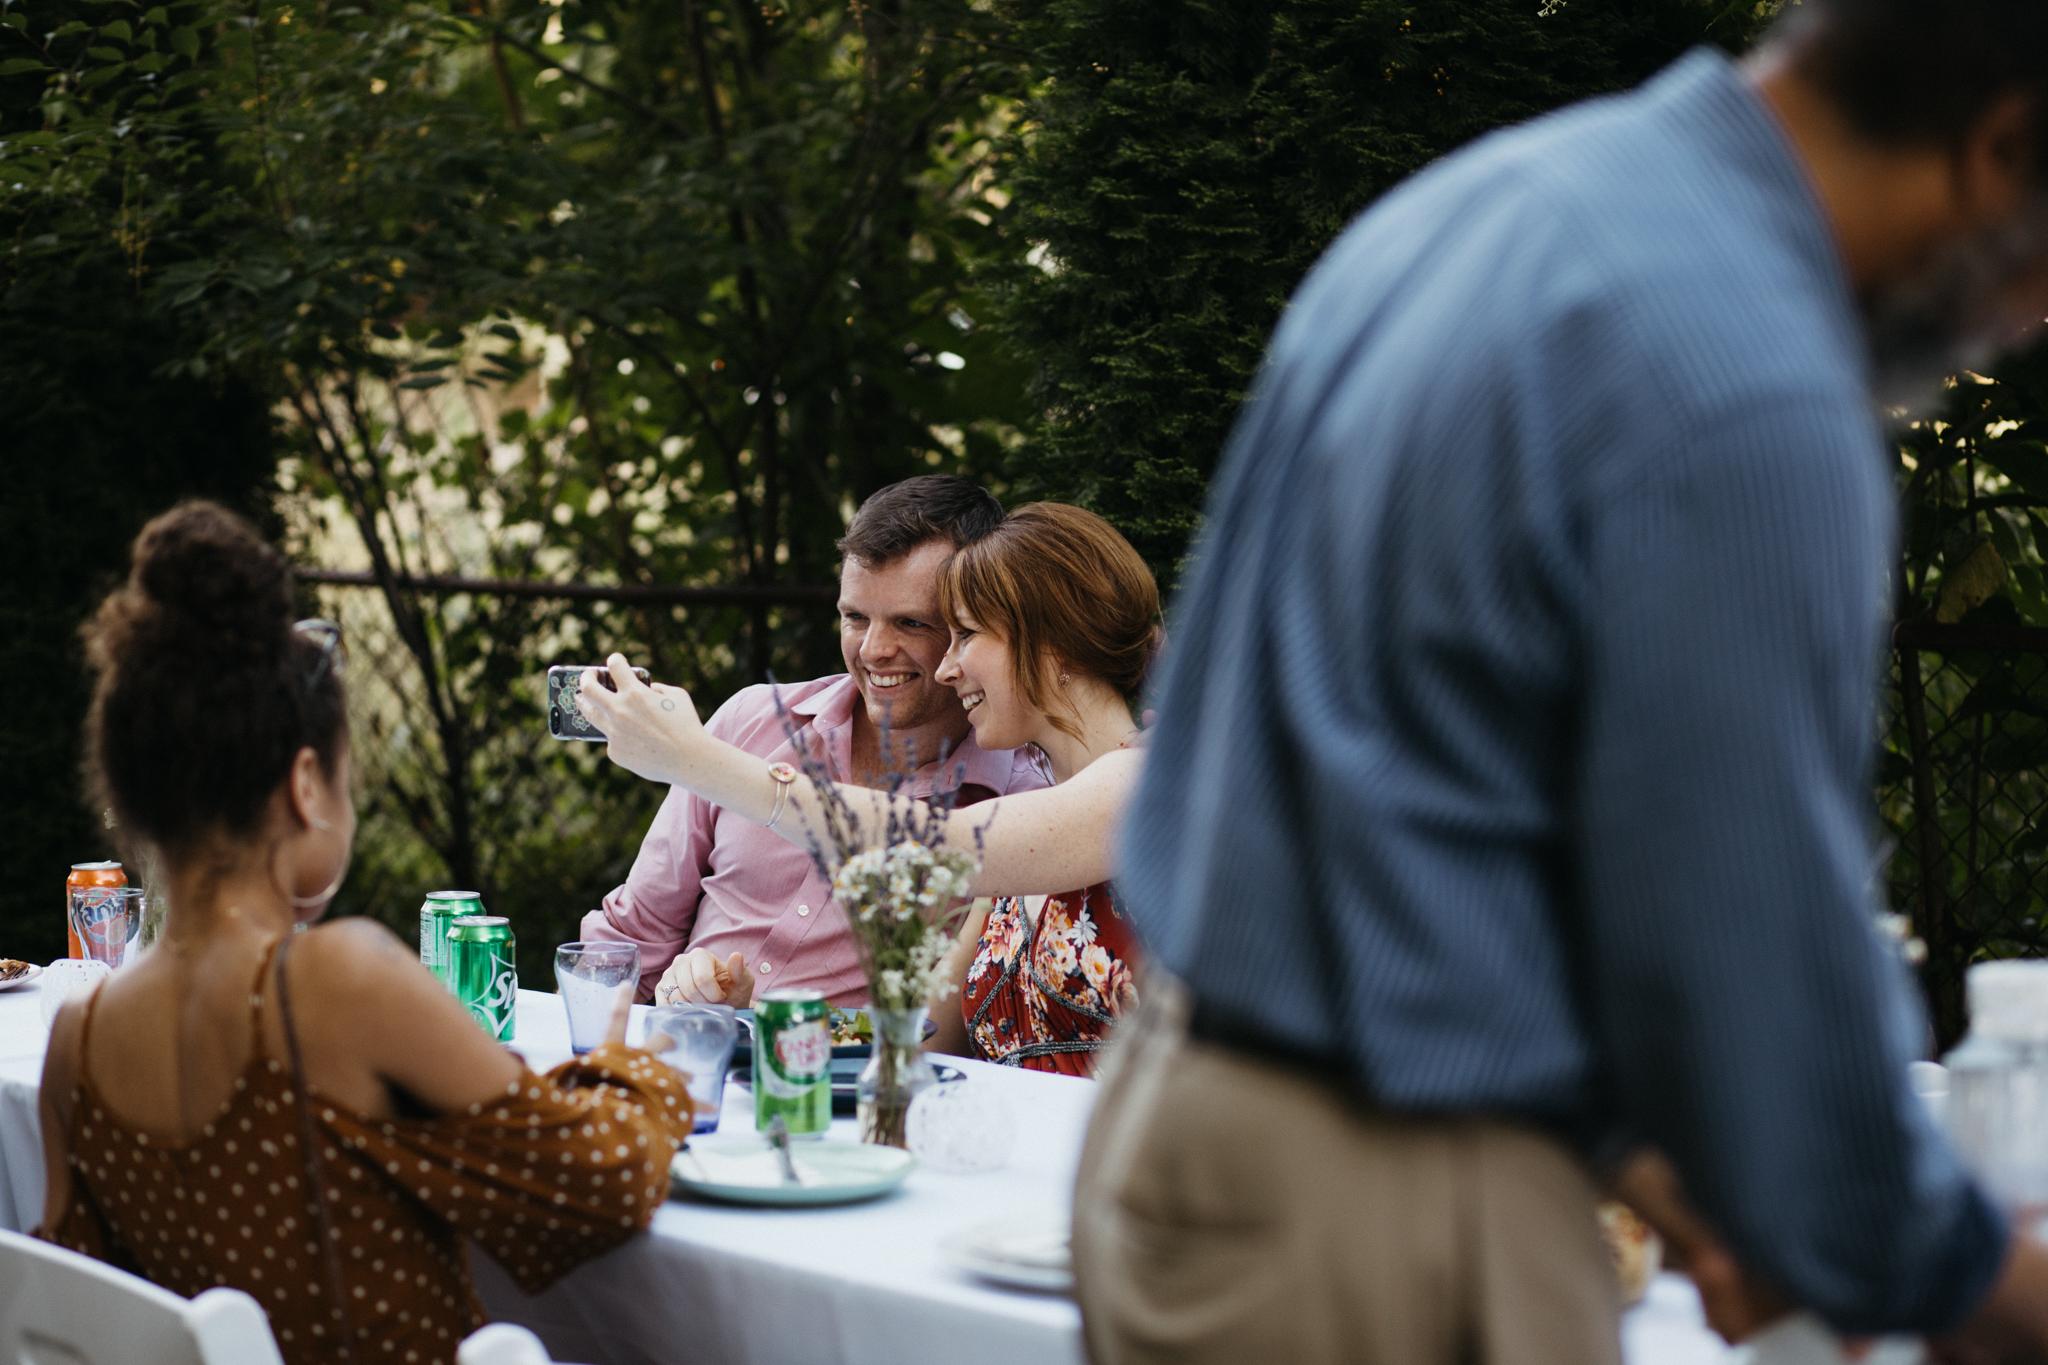 dorota_dwight_richmond_backyard_wedding-70.jpg